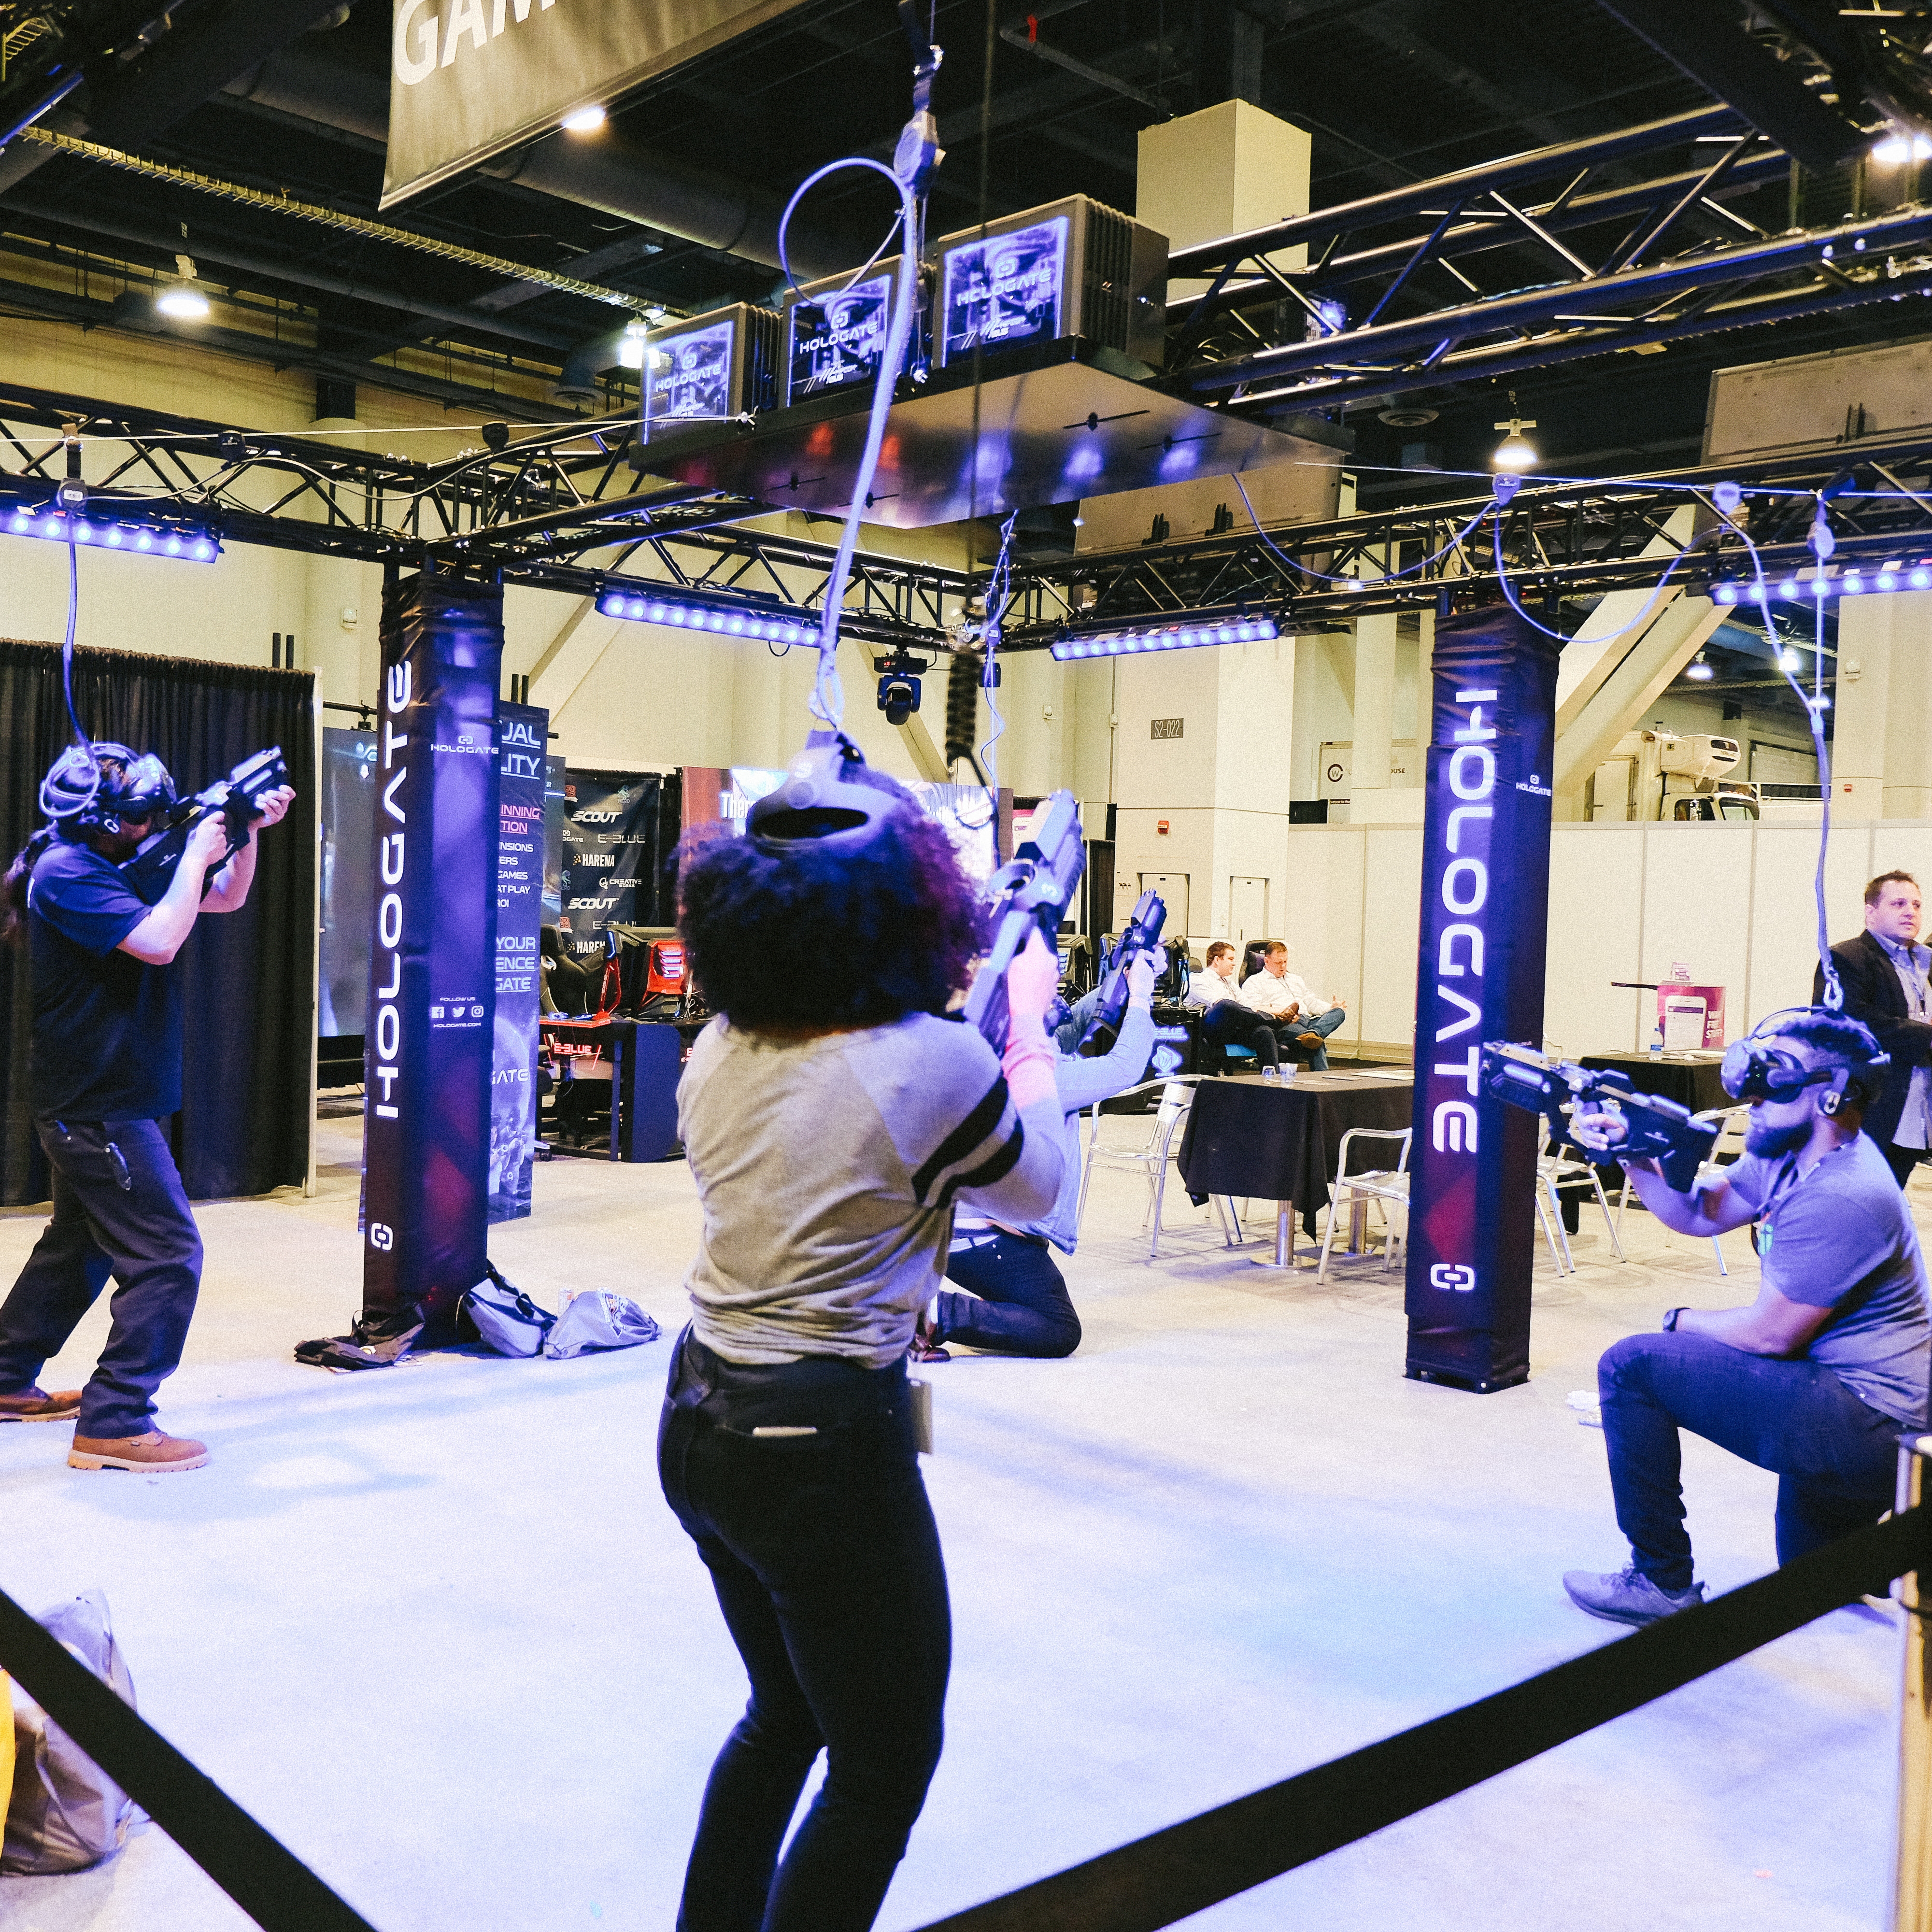 Virtual reality bar show